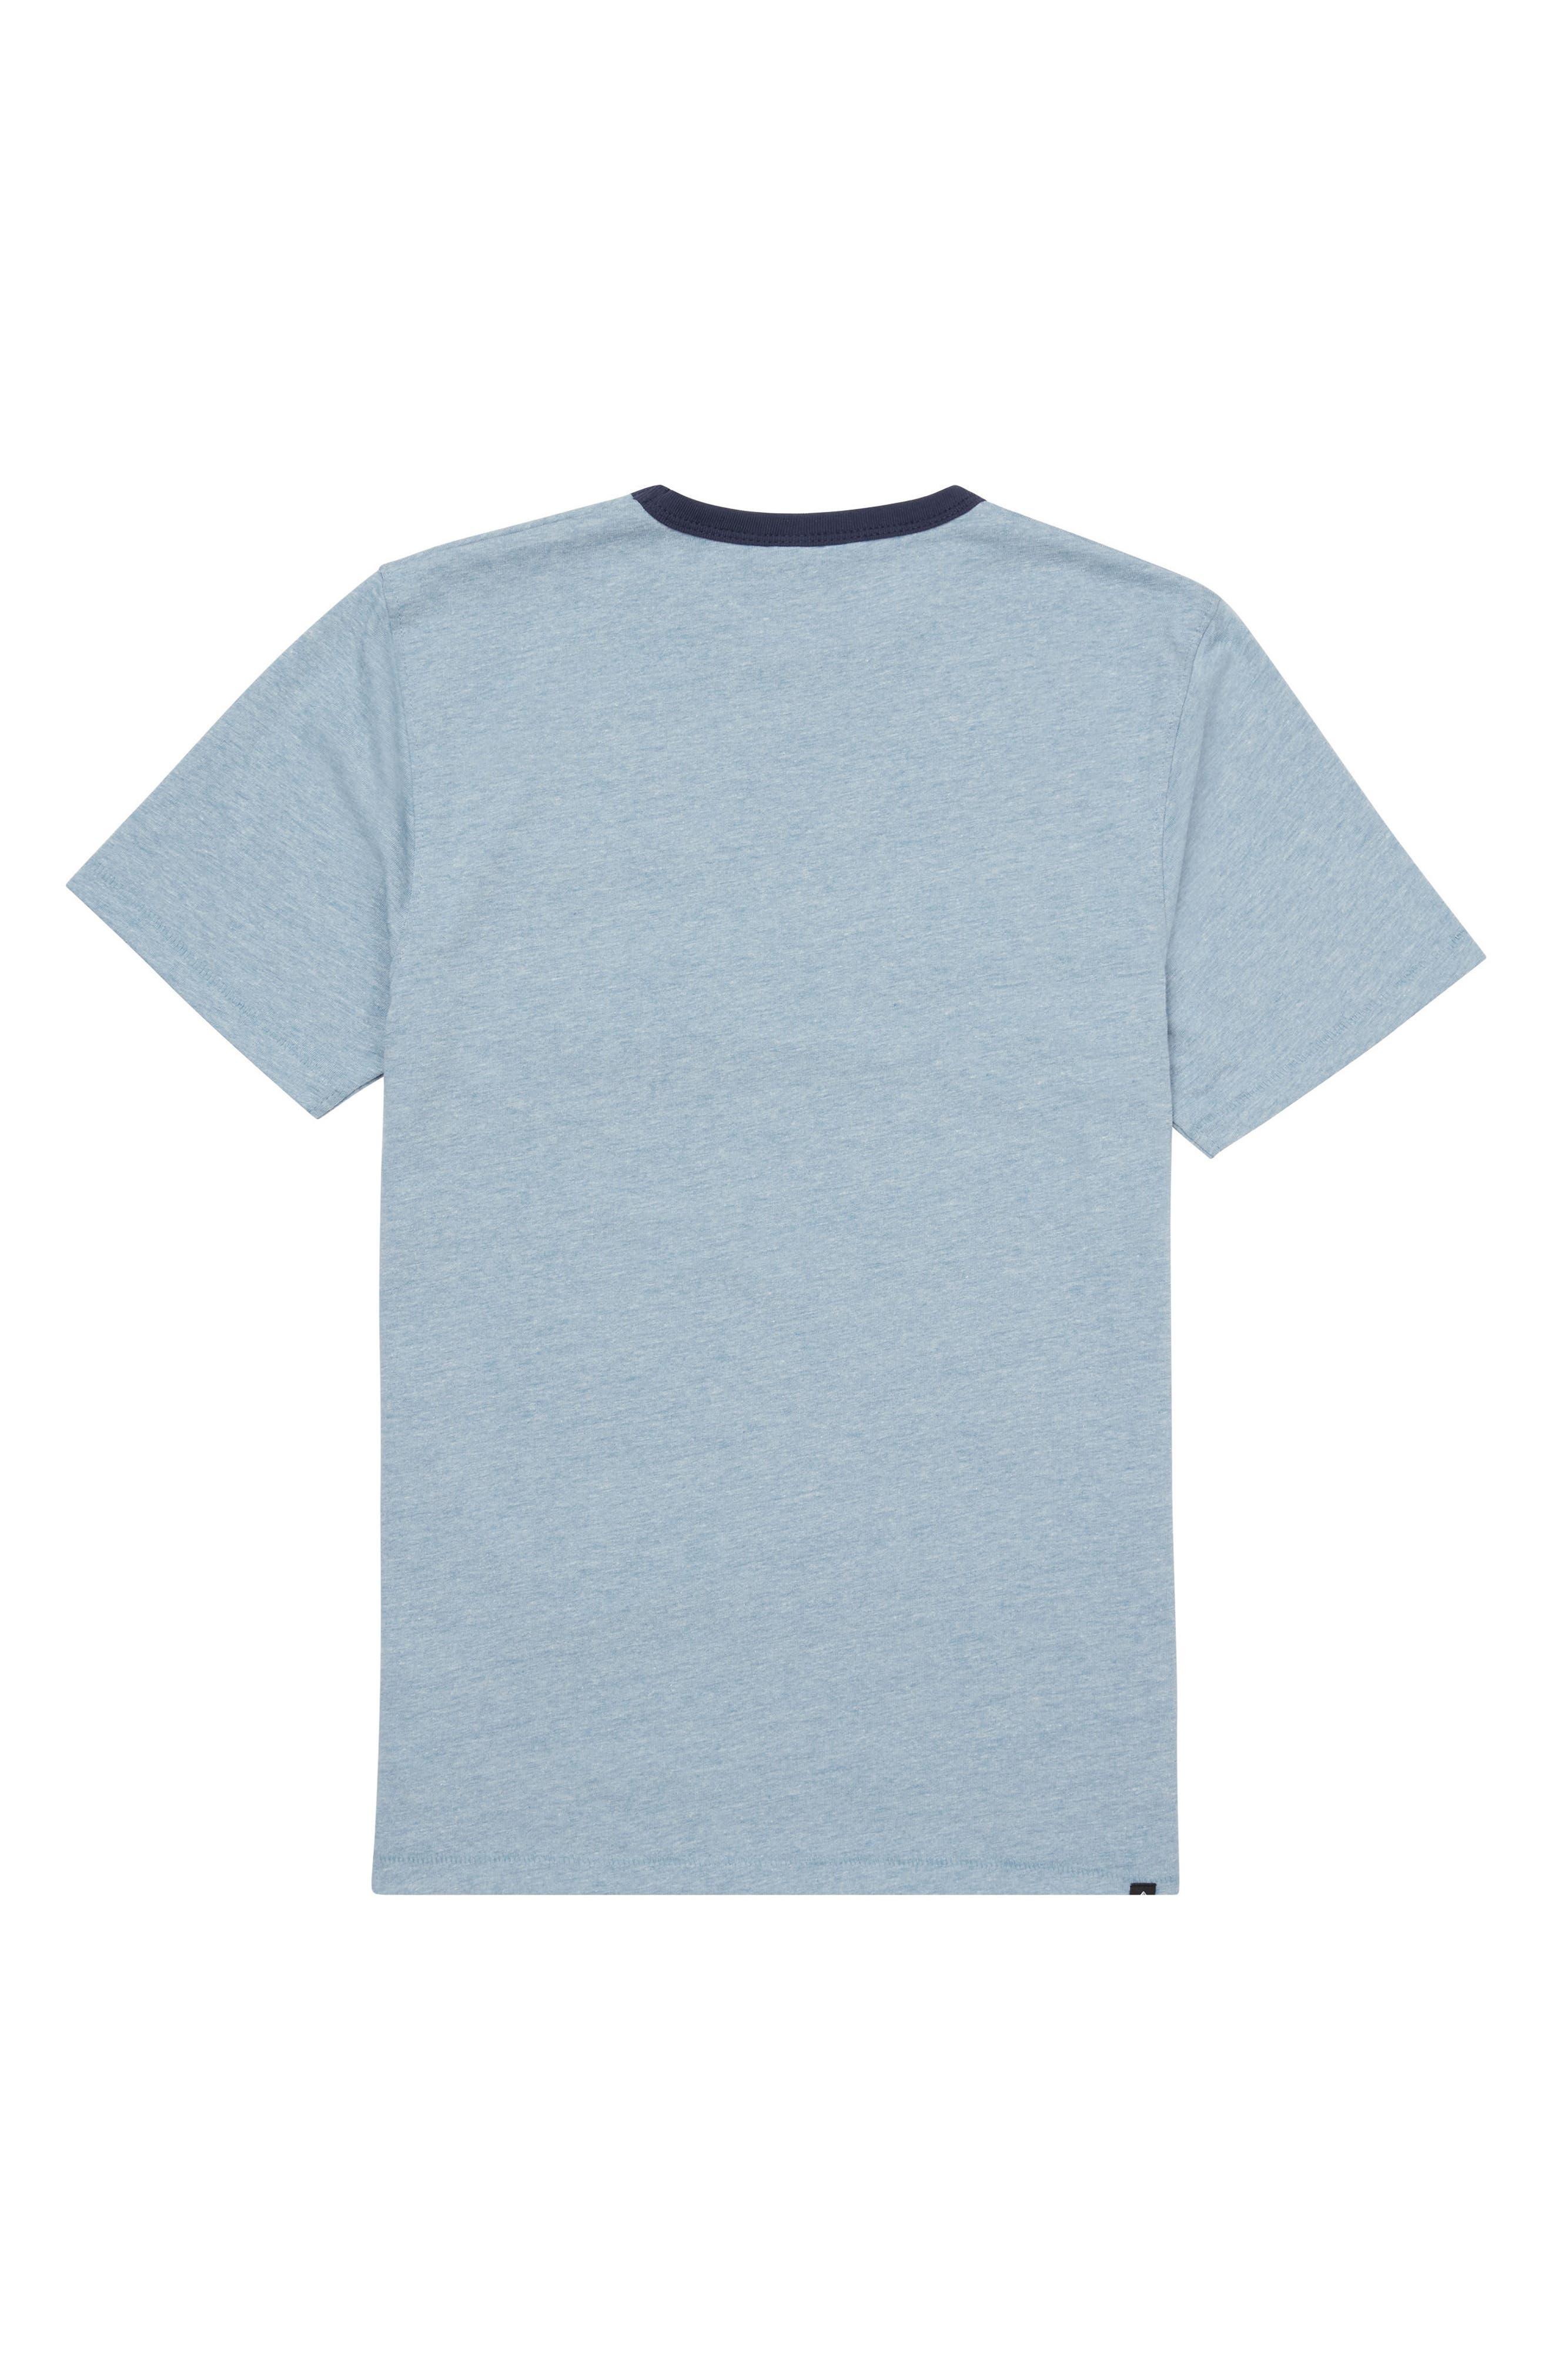 Point Place Crewneck T-Shirt,                             Alternate thumbnail 2, color,                             Indigo